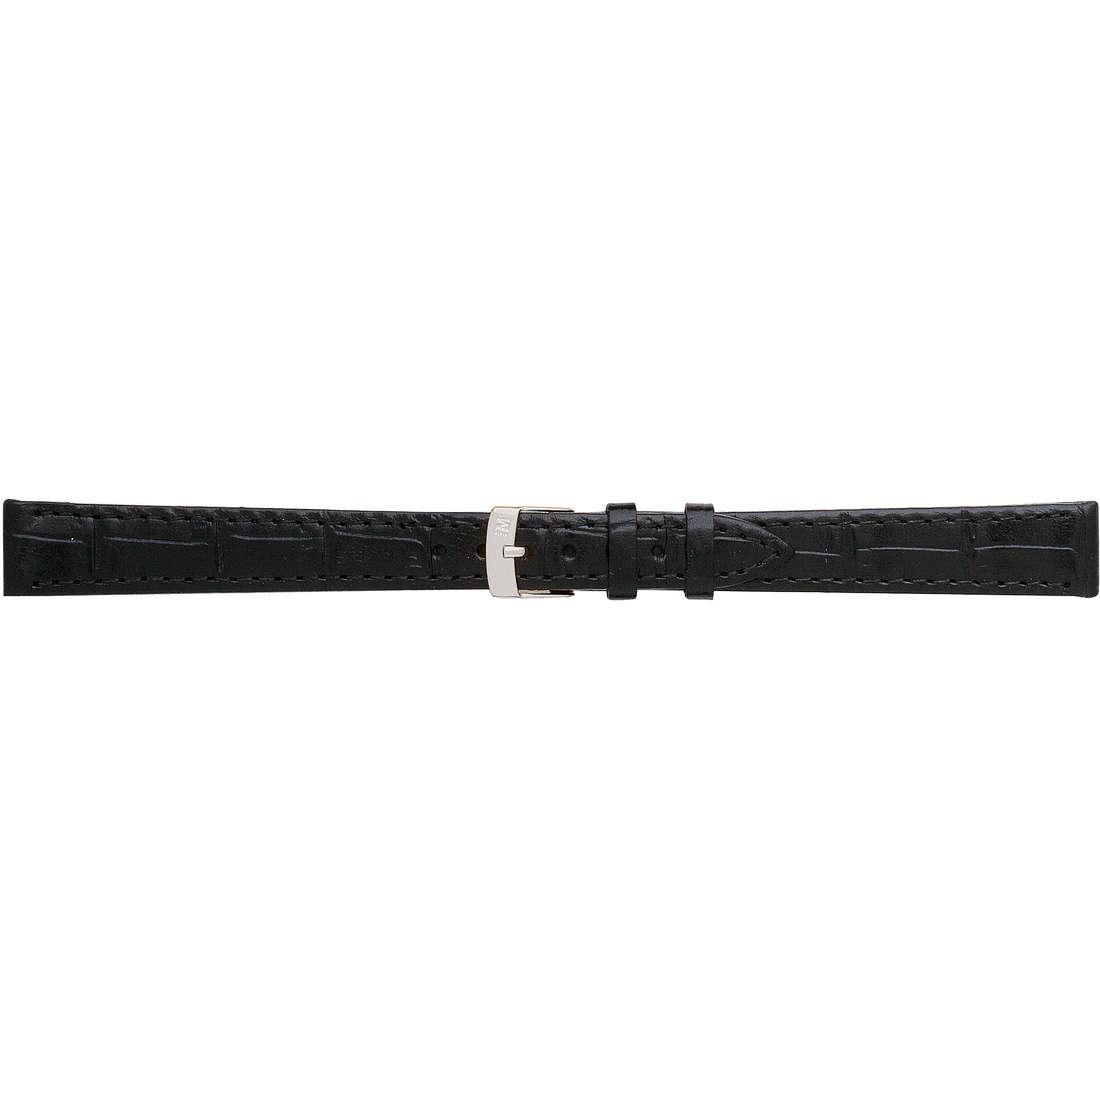 watch watch bands watch straps unisex Morellato I Lunghi A01Y2524656019CR18